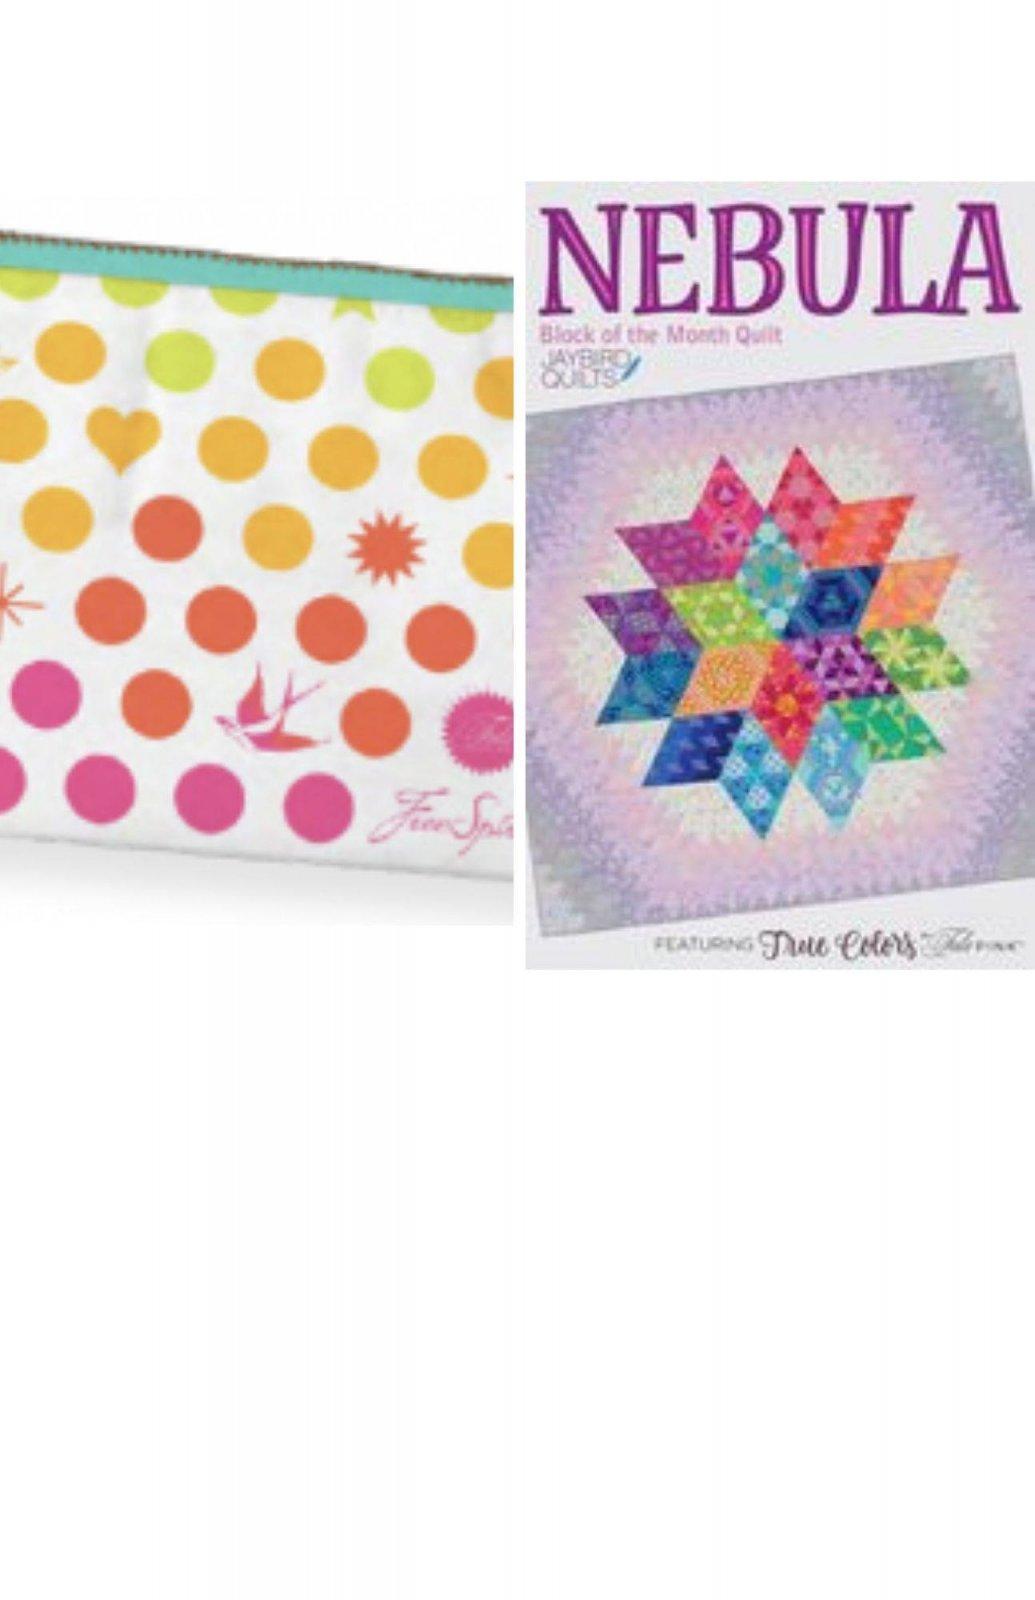 Nebula BOM includes SWAG! Kit 2